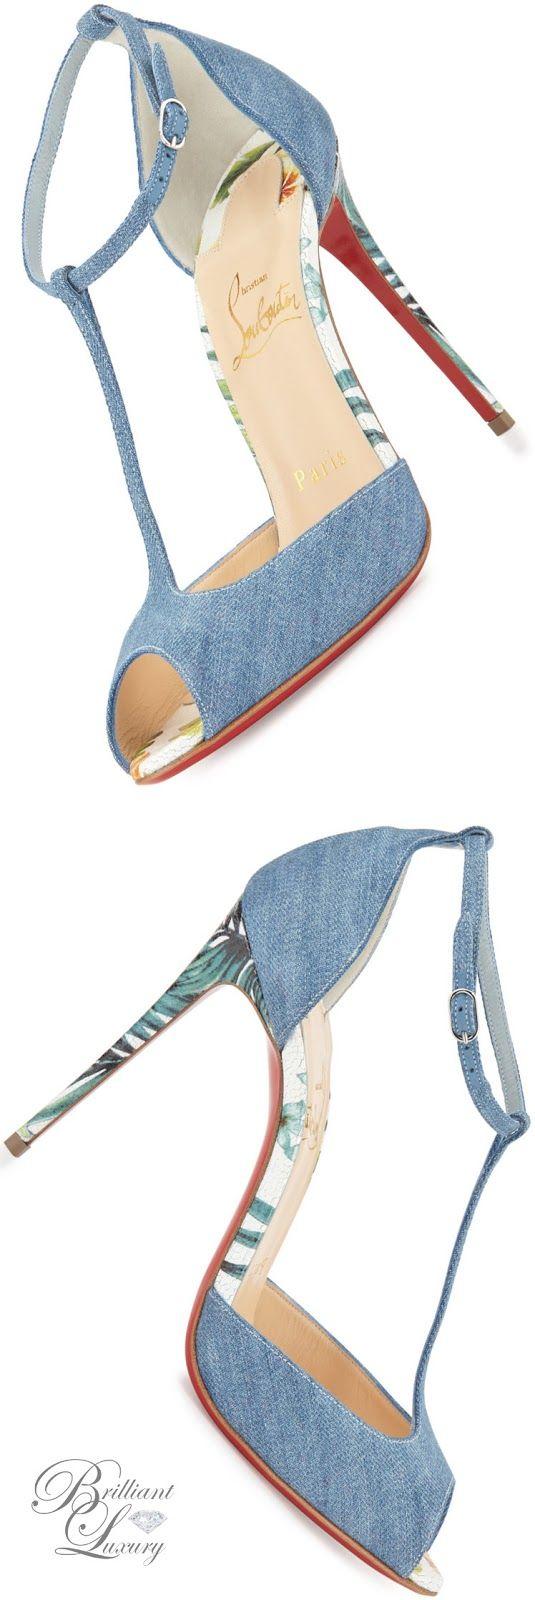 Brilliant Luxury * Christian Louboutin Senora Denim 100mm Red Sole Sandal